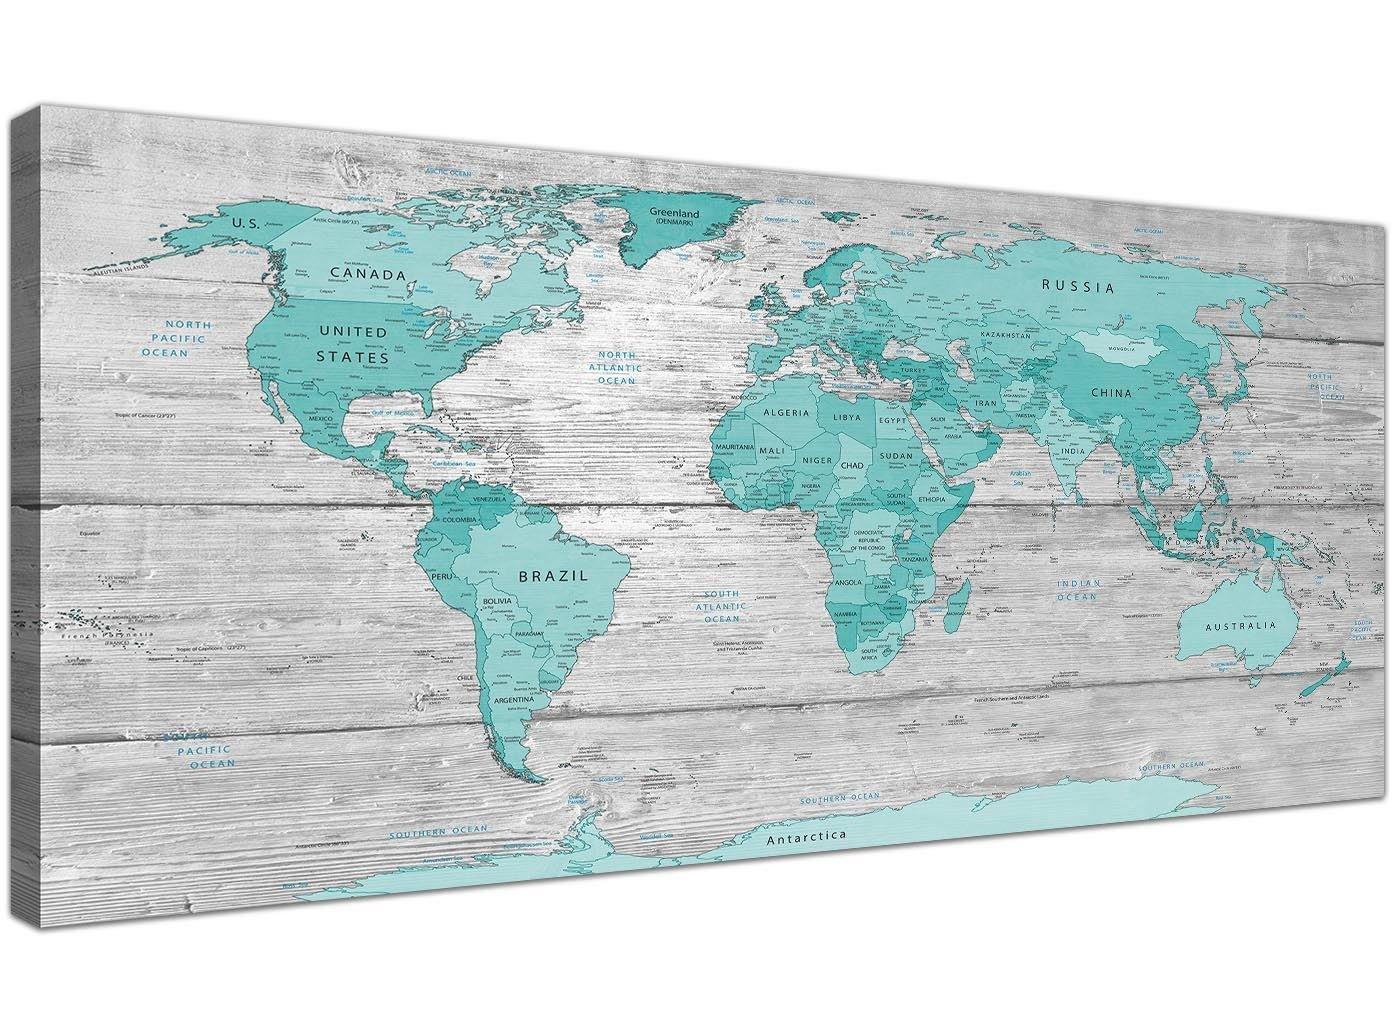 Große Blaugrün Grau Weltkarte Atlas Leinwand Wand Kunstdruck 120 cm ...